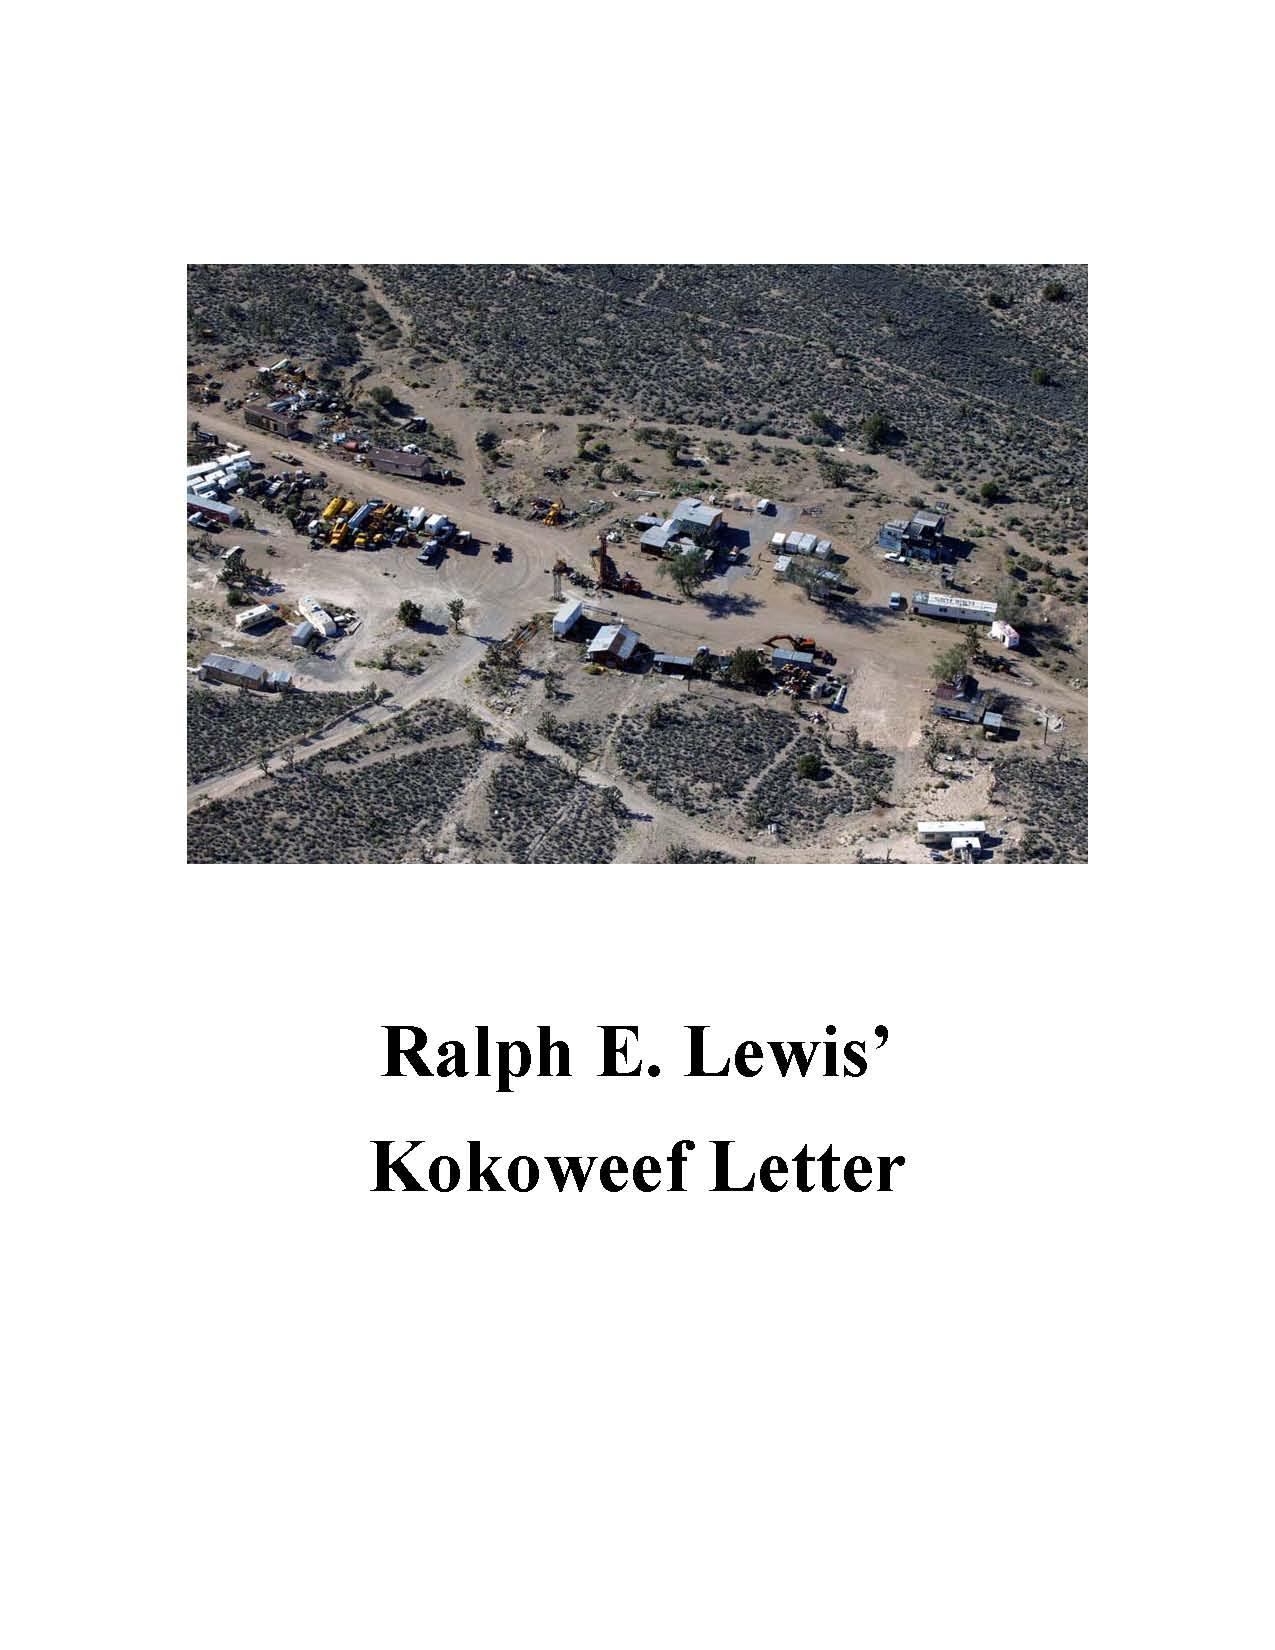 Index of Ralph Lewis FilesRELewis Imagesdivdiv class